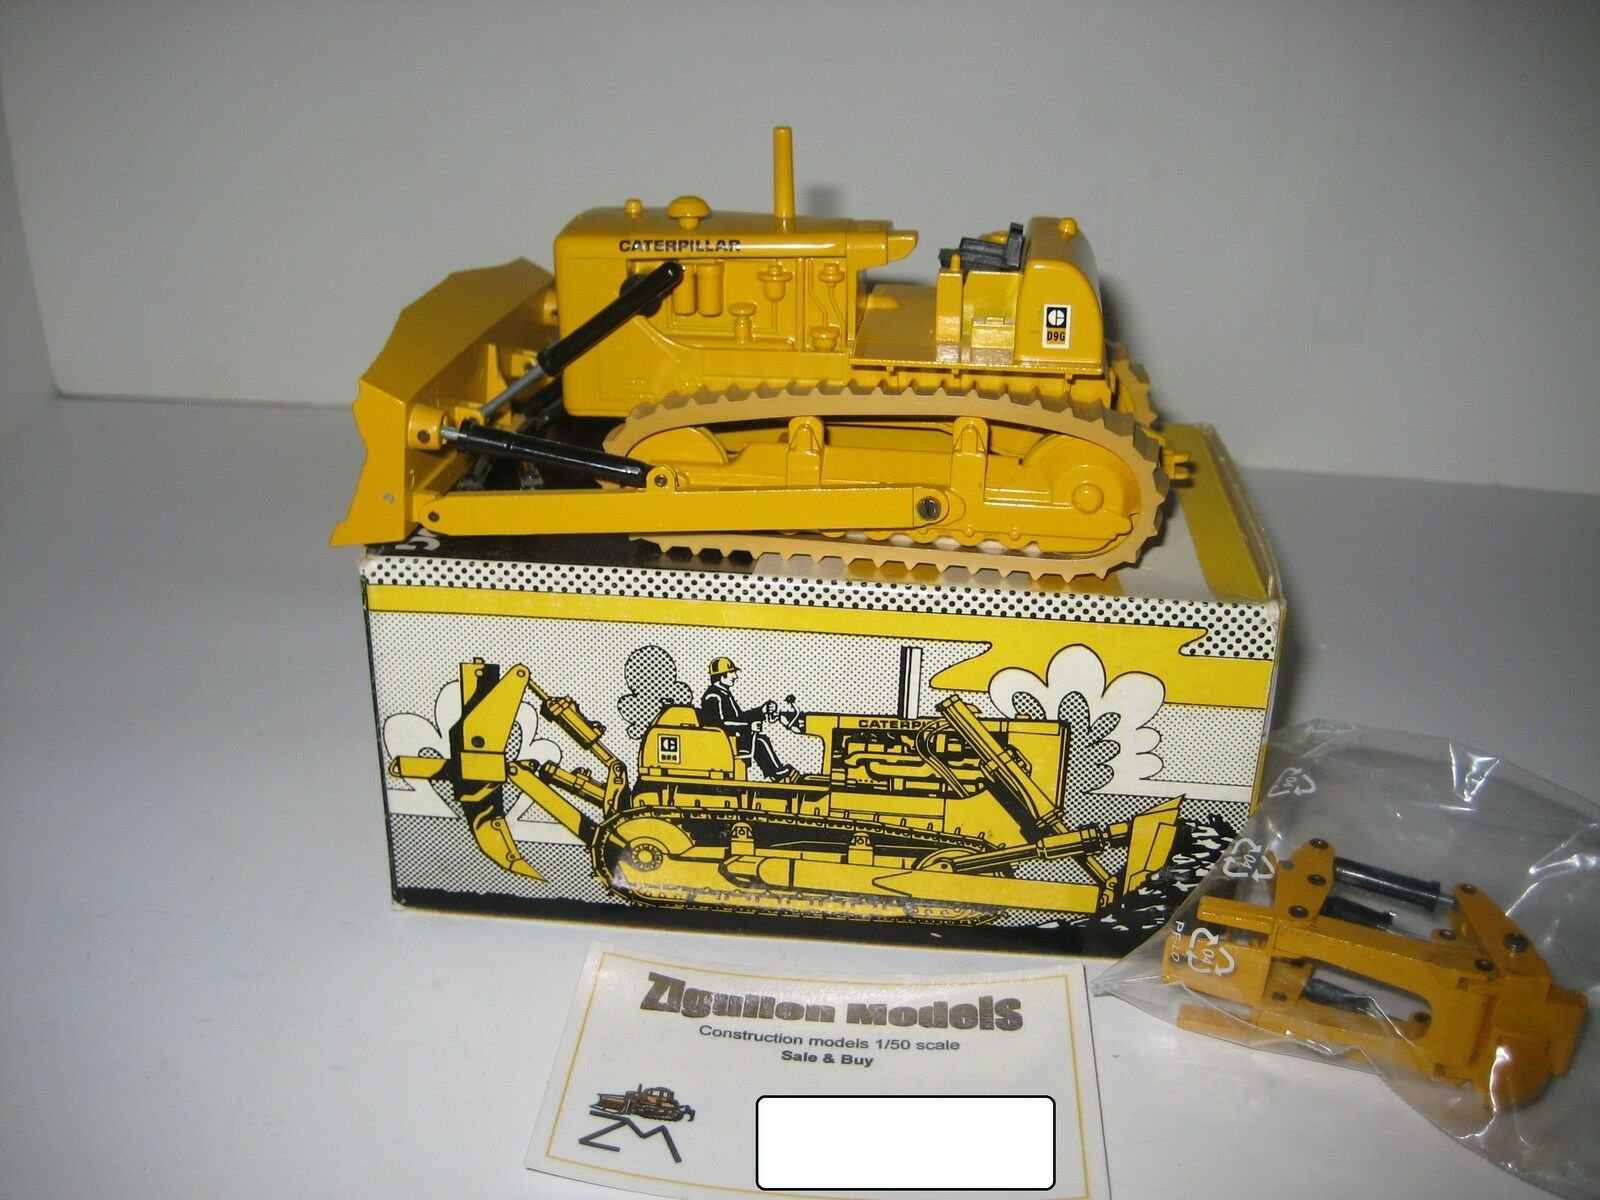 CATERPILLAR D 9 G Bouteur Ripper  2871.4 CONRAD 1 50 NEUF dans sa boîte